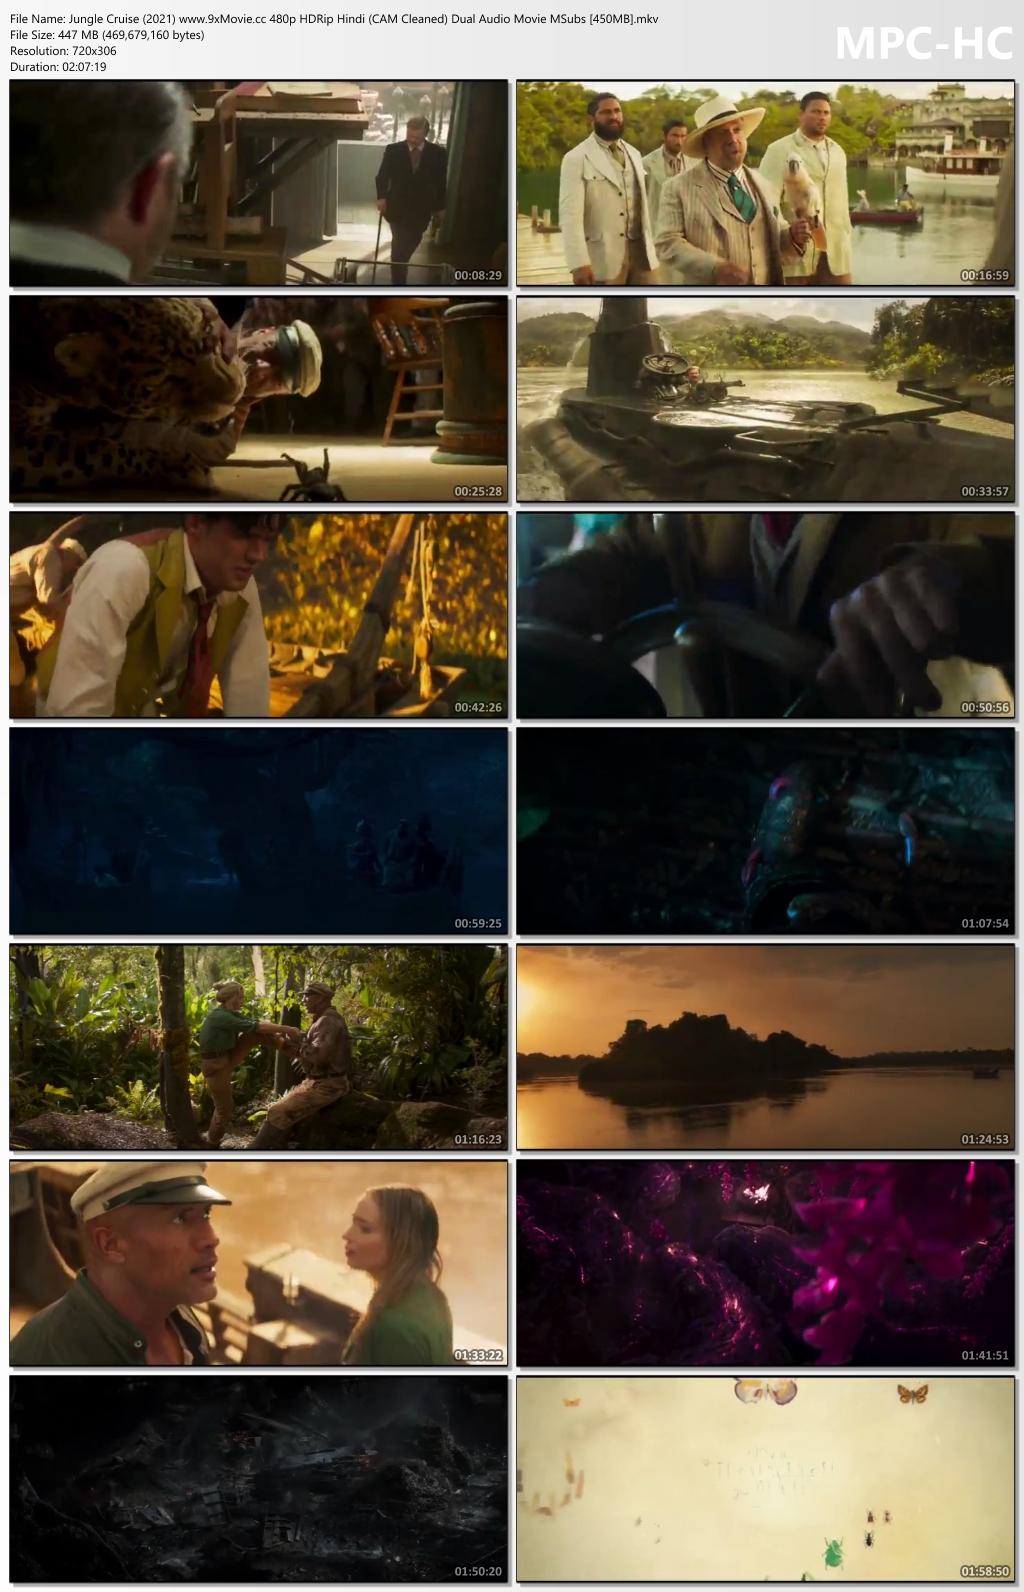 Jungle-Cruise-2021-www-9x-Movie-cc-480p-HDRip-Hindi-CAM-Cleaned-Dual-Audio-Movie-MSubs-450-MB-mkv